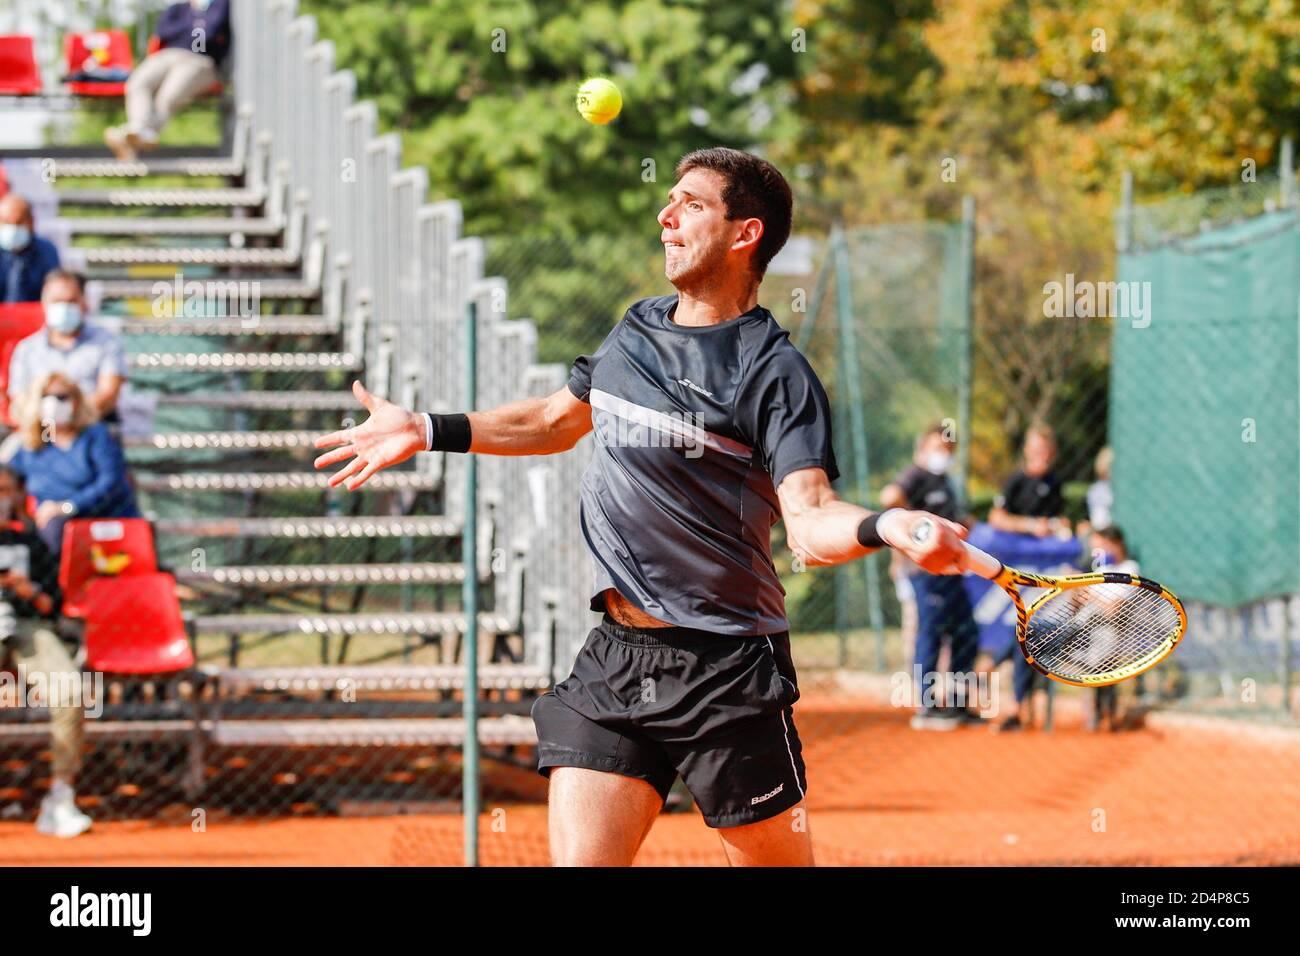 Federico Delbonis during ATP Challenger 125 - Internazionali Emilia Romagna, Tennis Internationals in parma, Italy, October 09 2020 Stock Photo